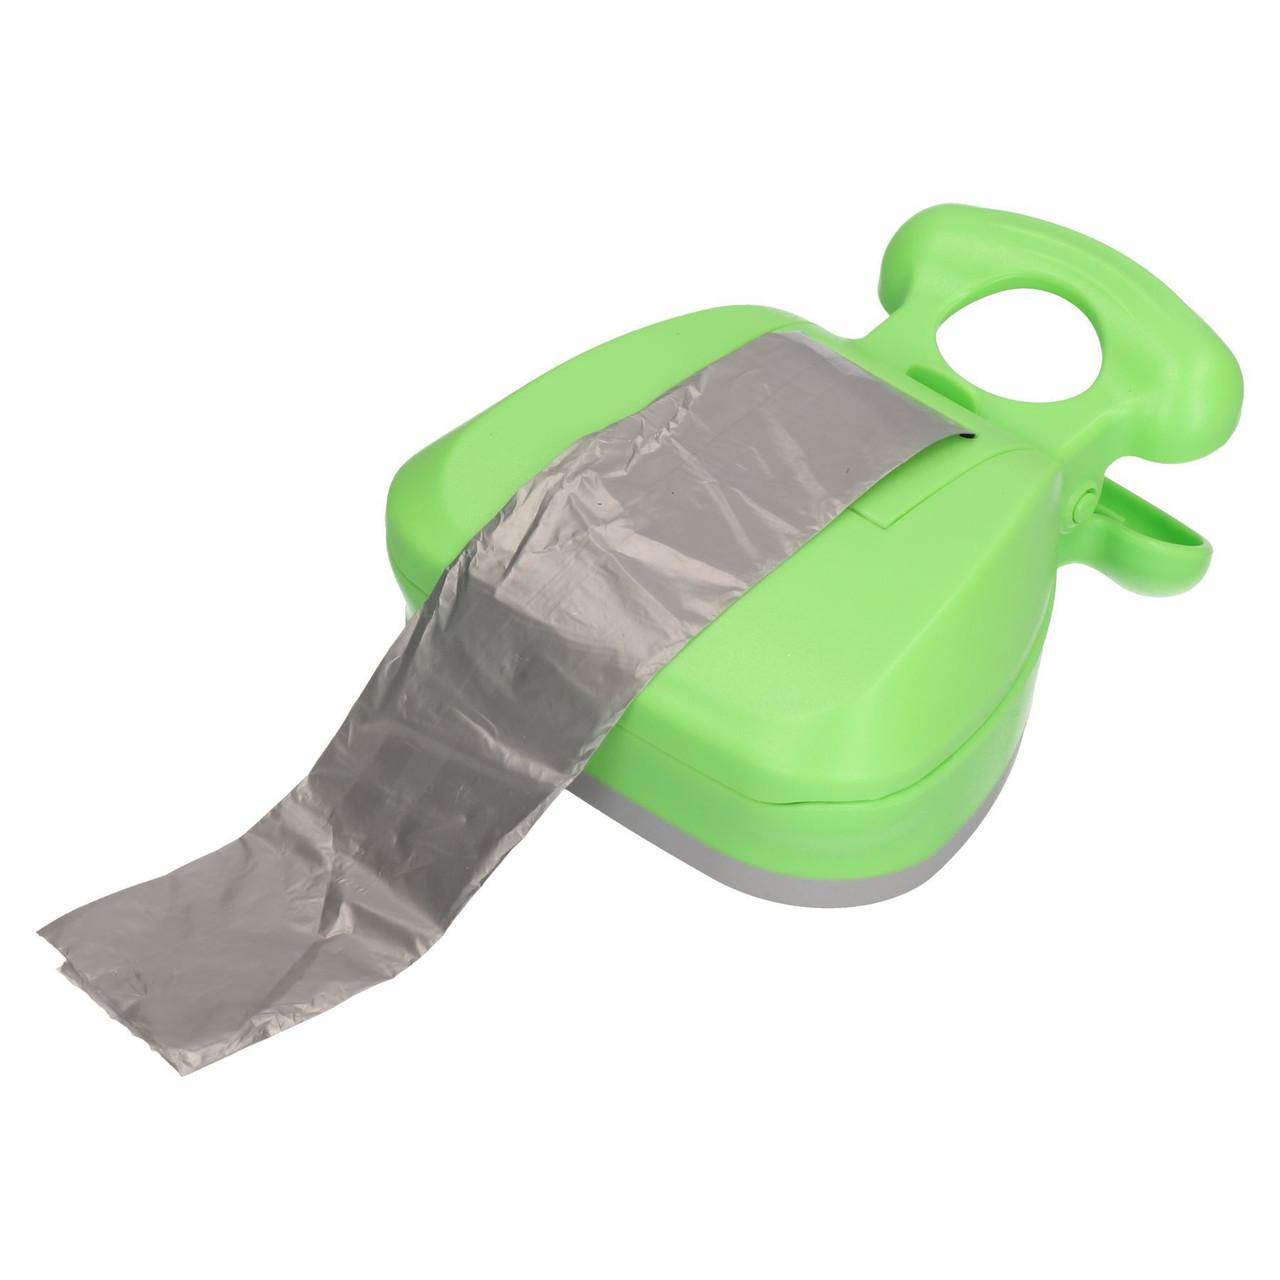 Portable Waste Scooper & Magnetic Opening Dog Pet Training Treat Bag